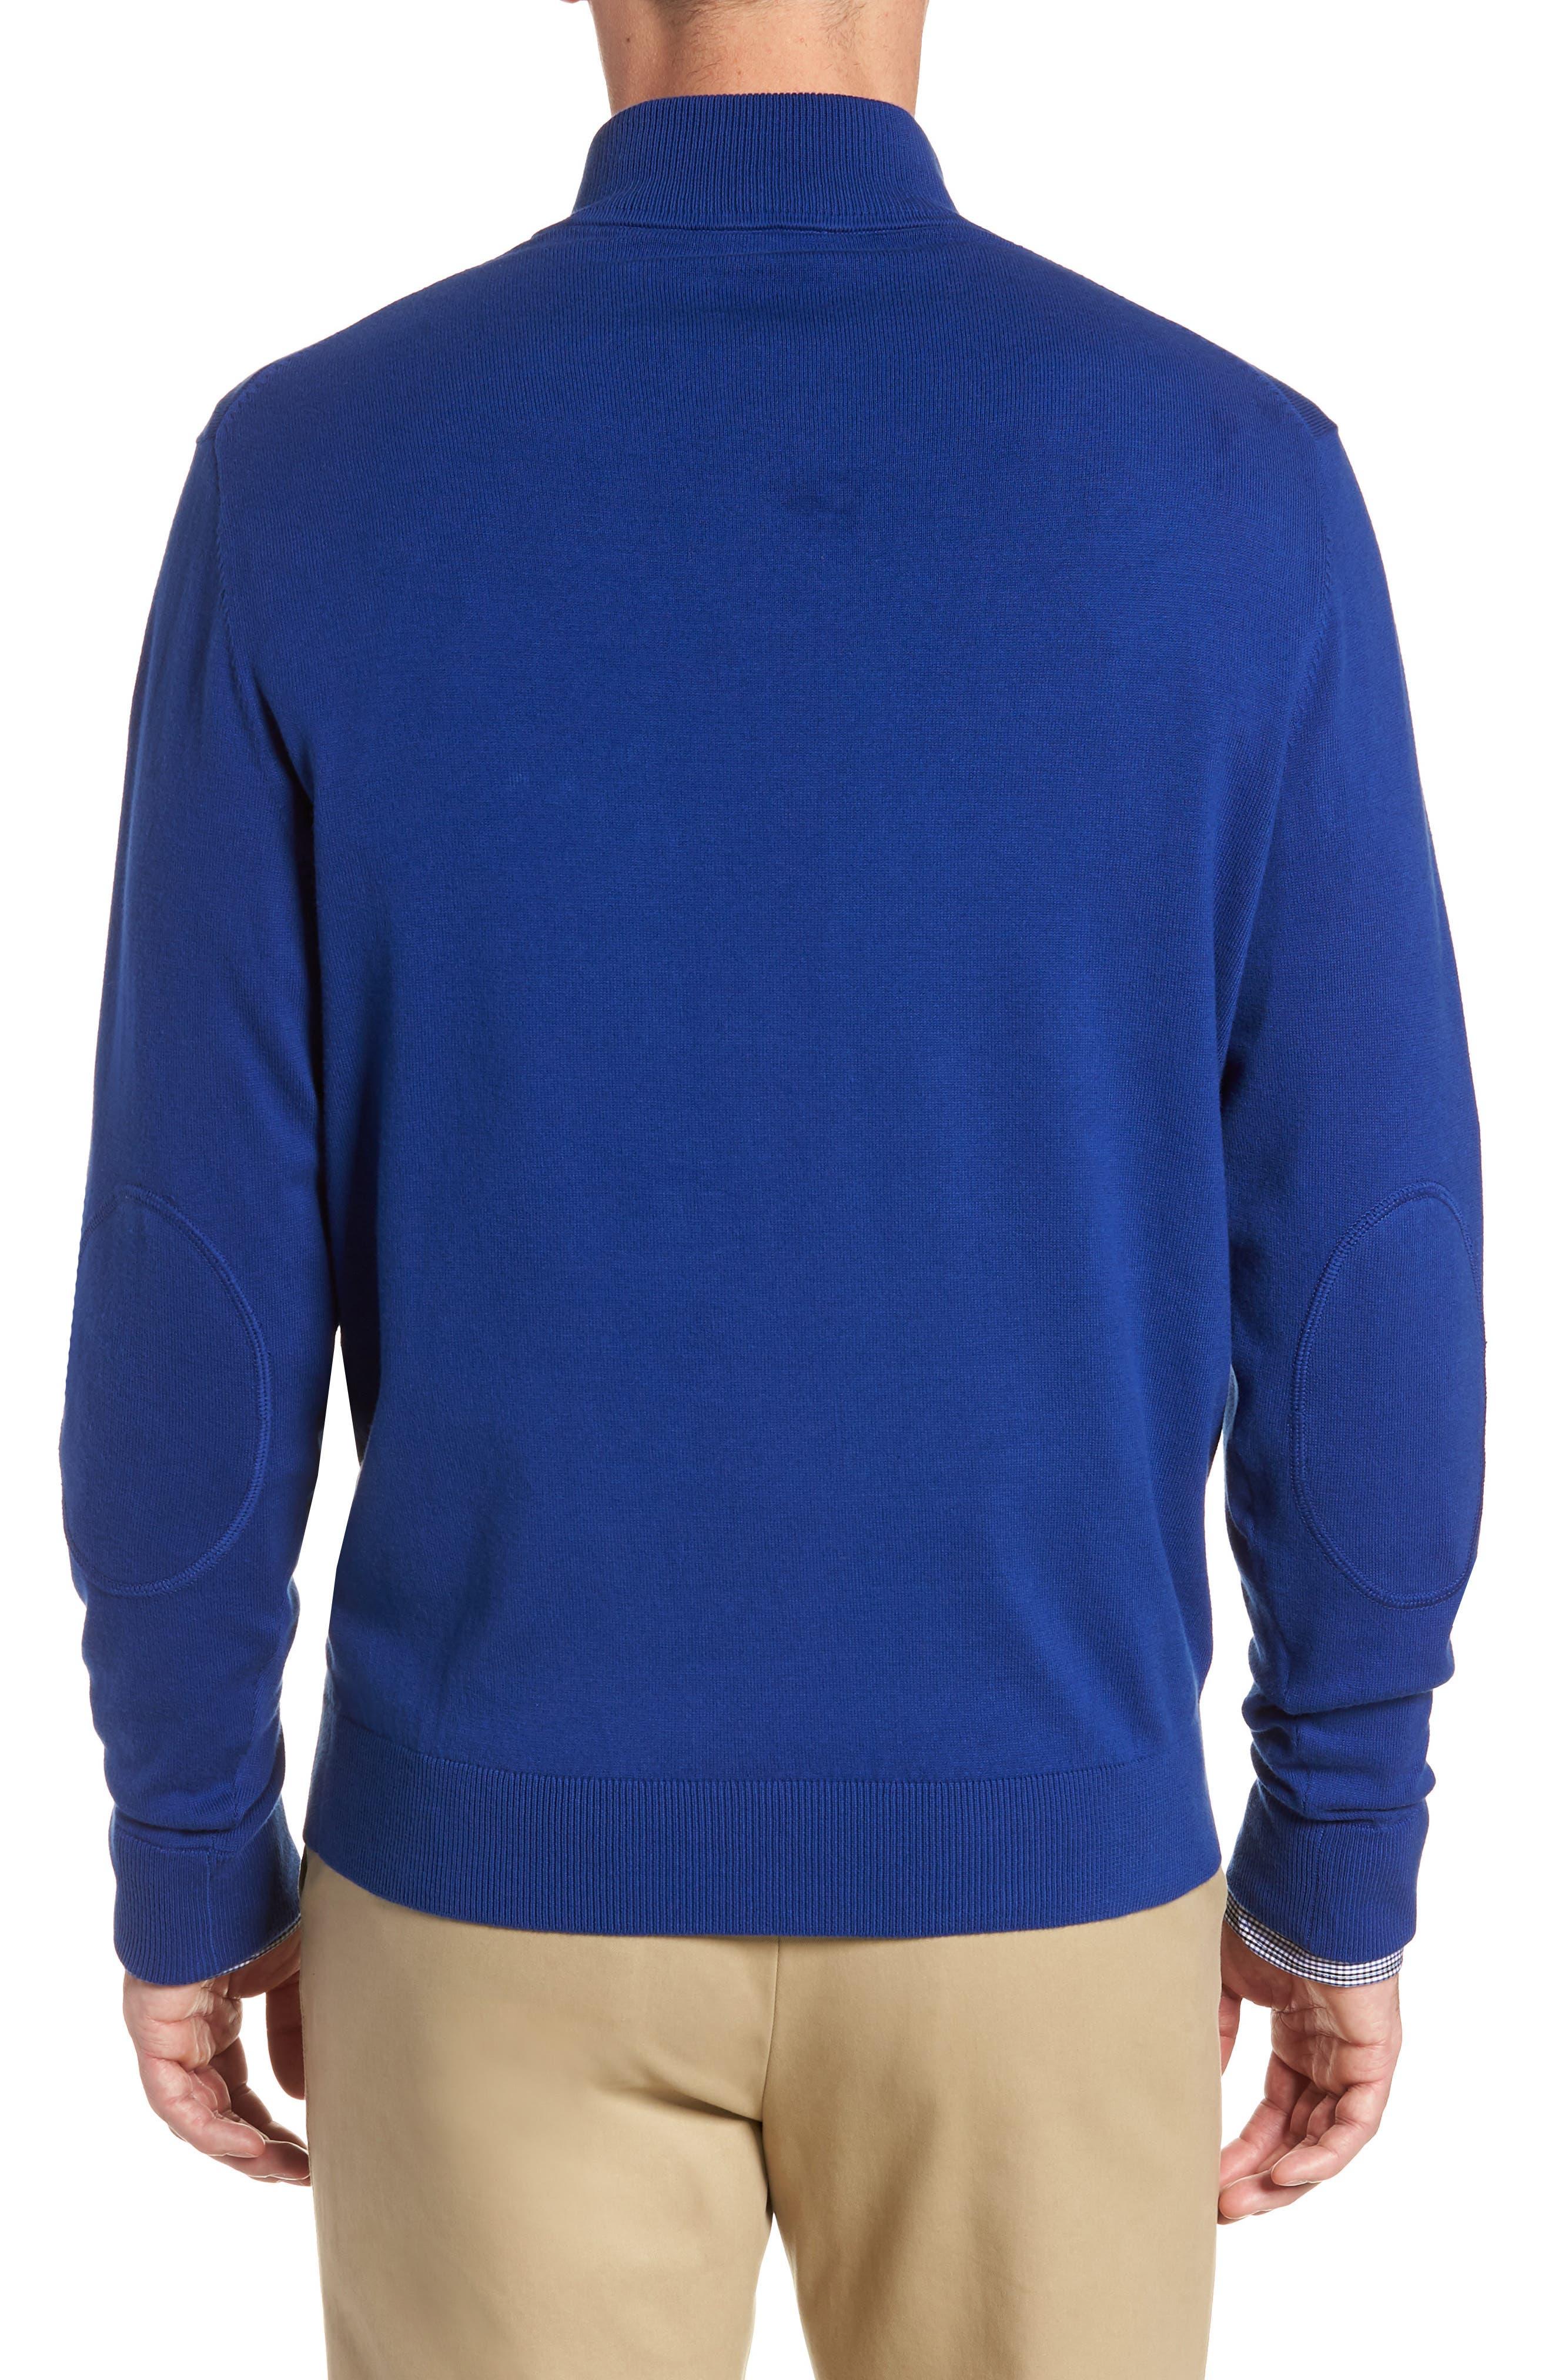 CUTTER & BUCK, Lakemont Half Zip Sweater, Alternate thumbnail 2, color, 419